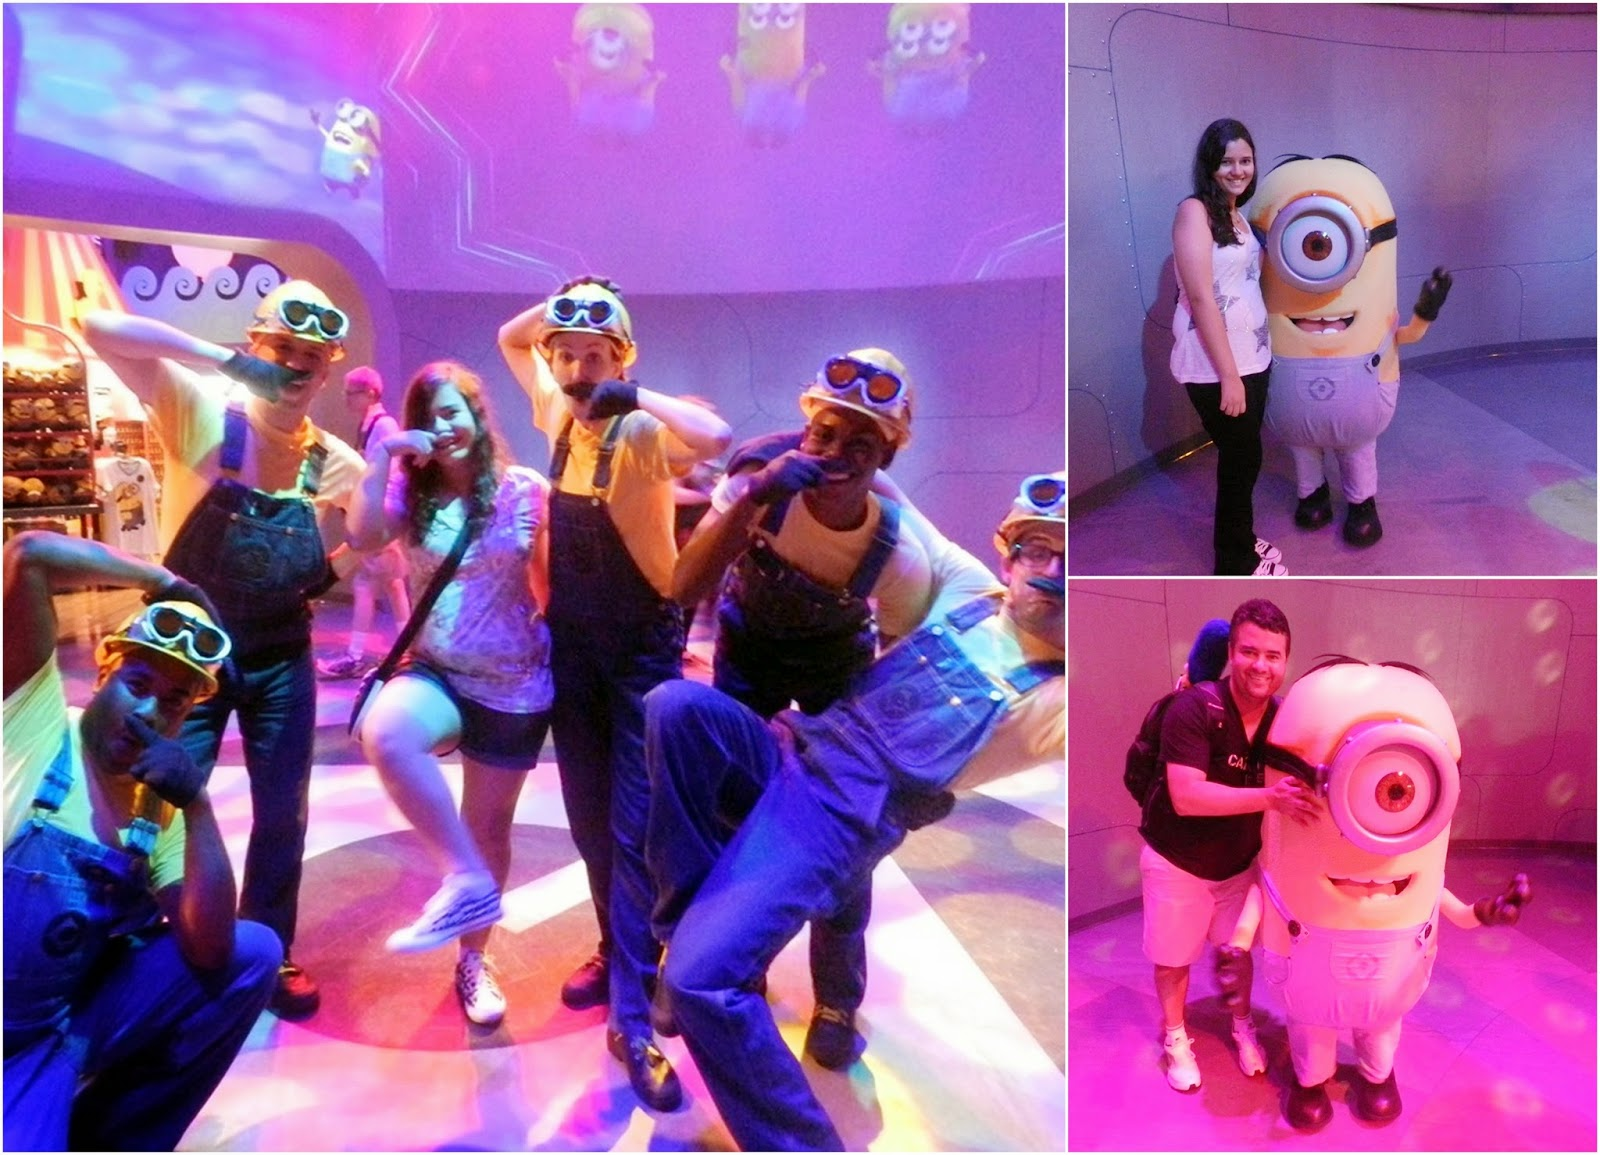 Universal Studios - Despicable me - Minions